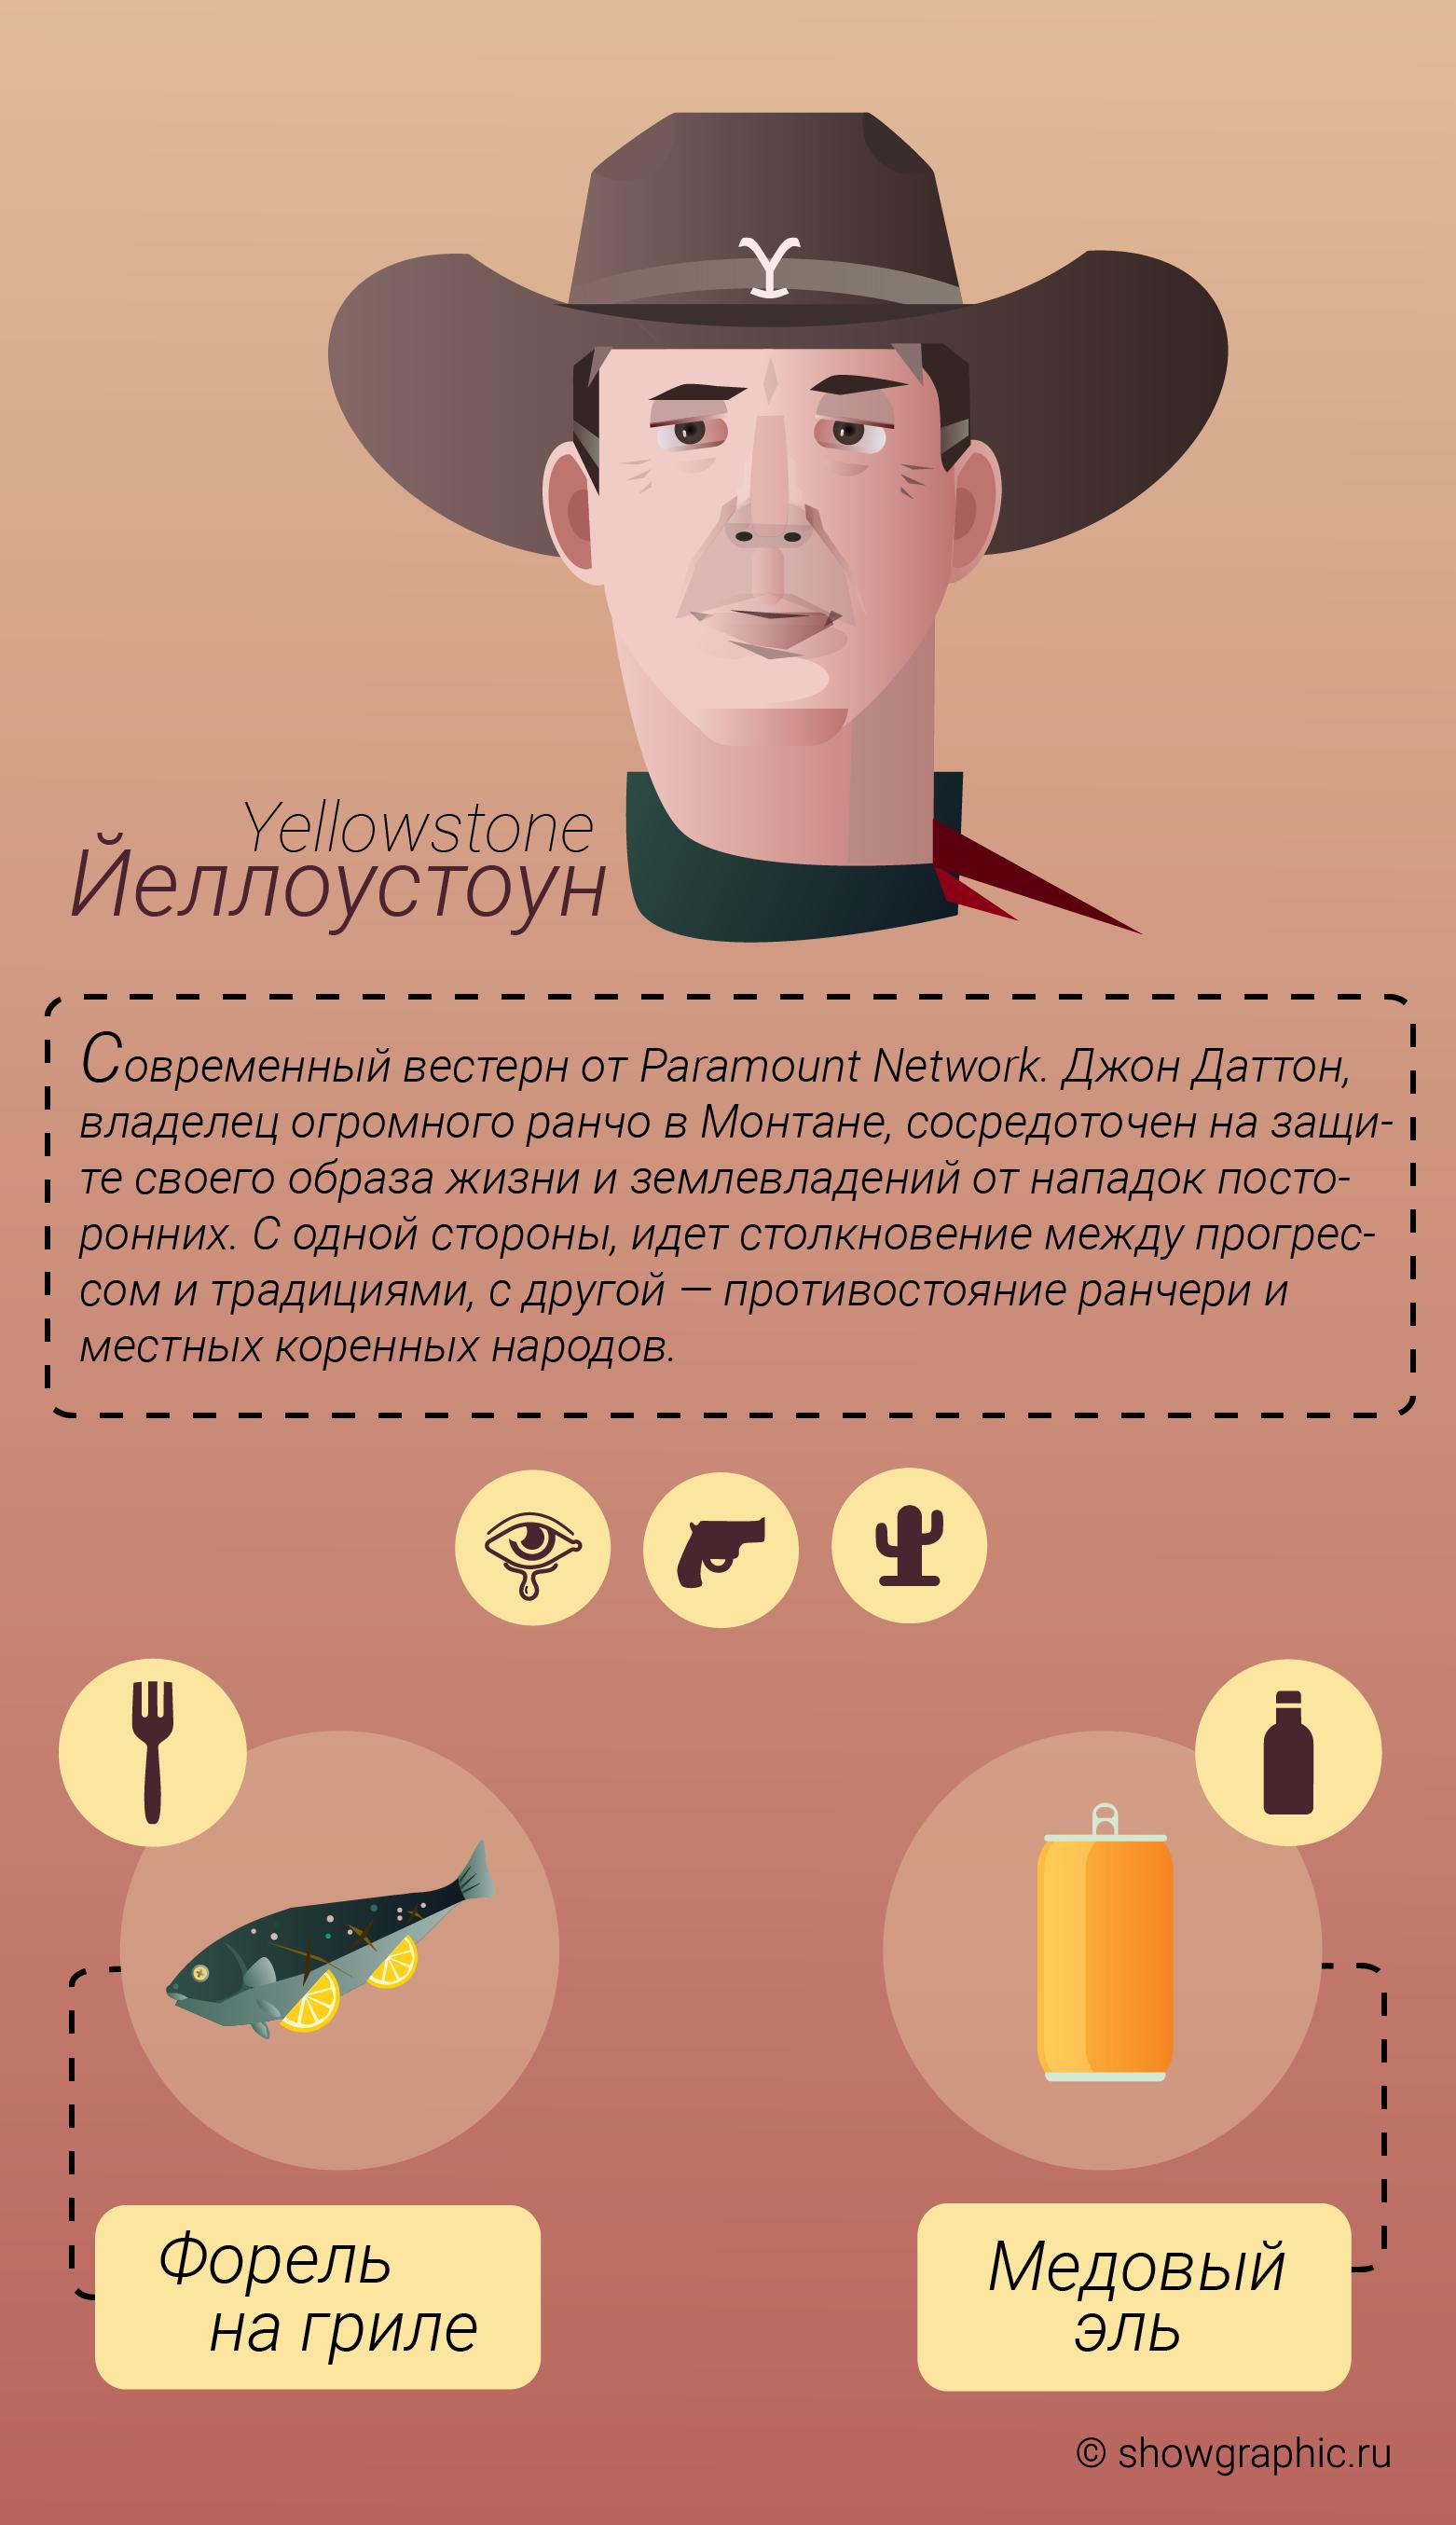 йеллоустоун инфографика